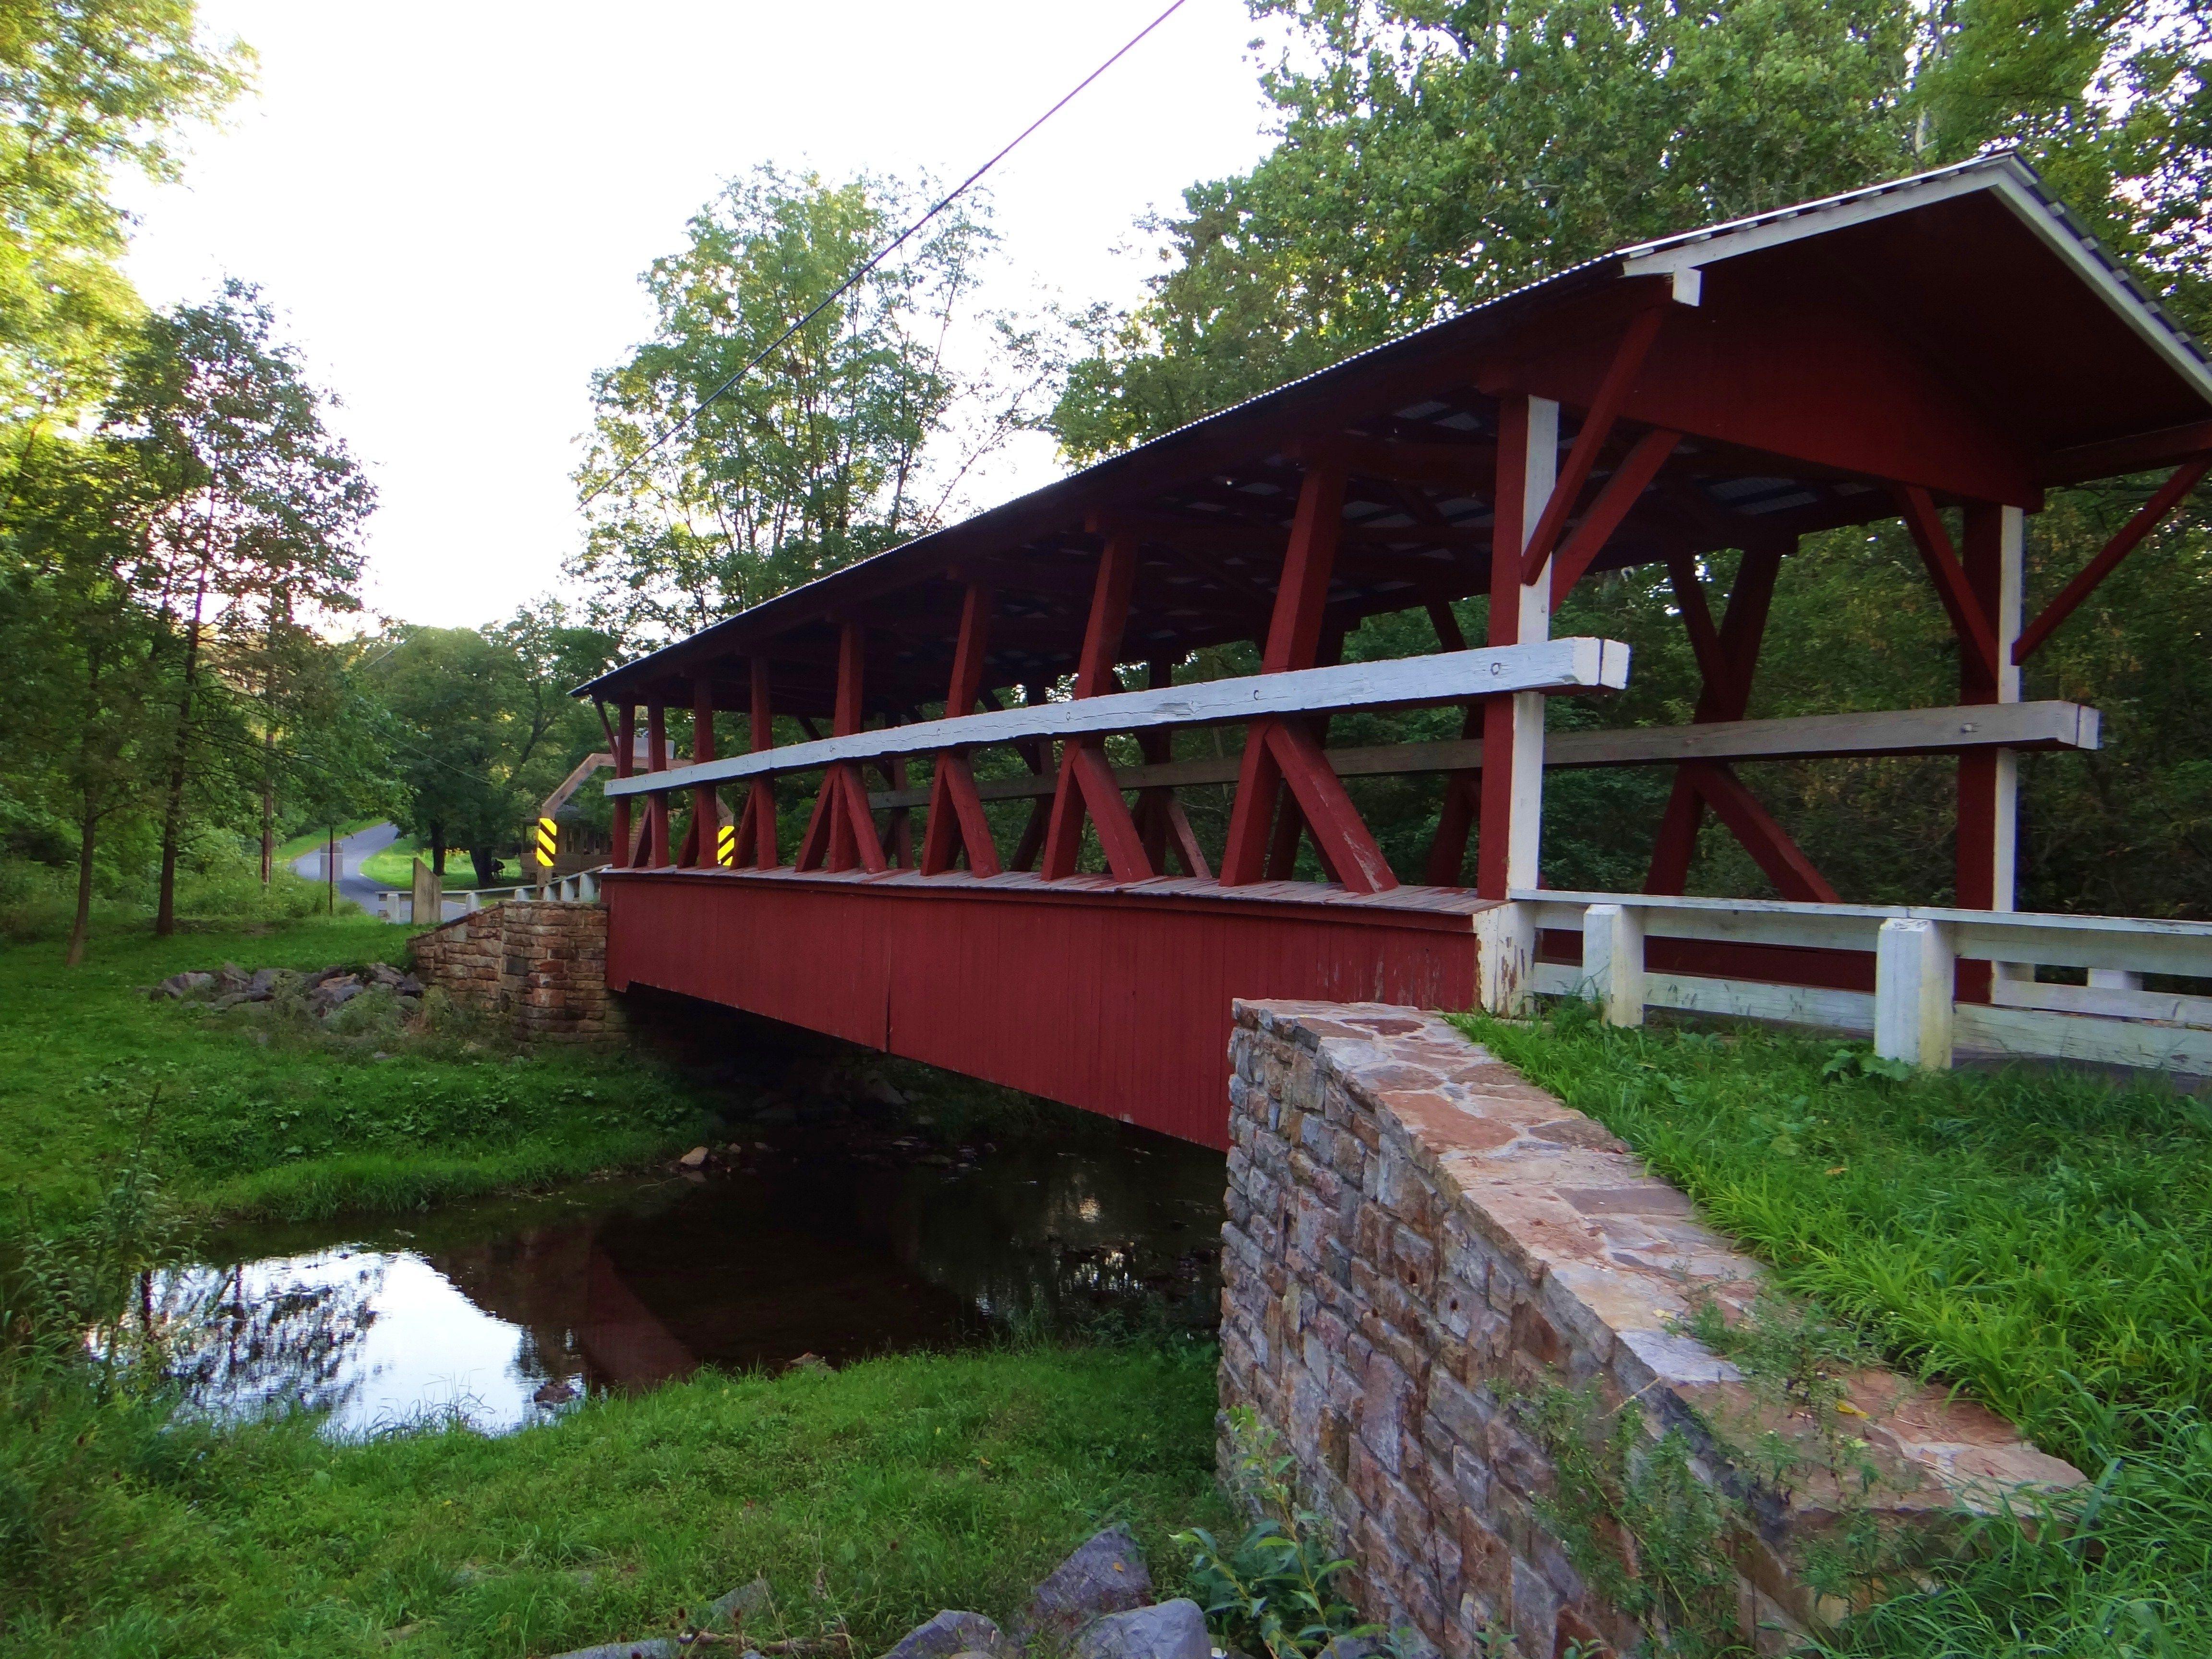 Pennsylvania covered bridge | Covered bridges, Old barns ...